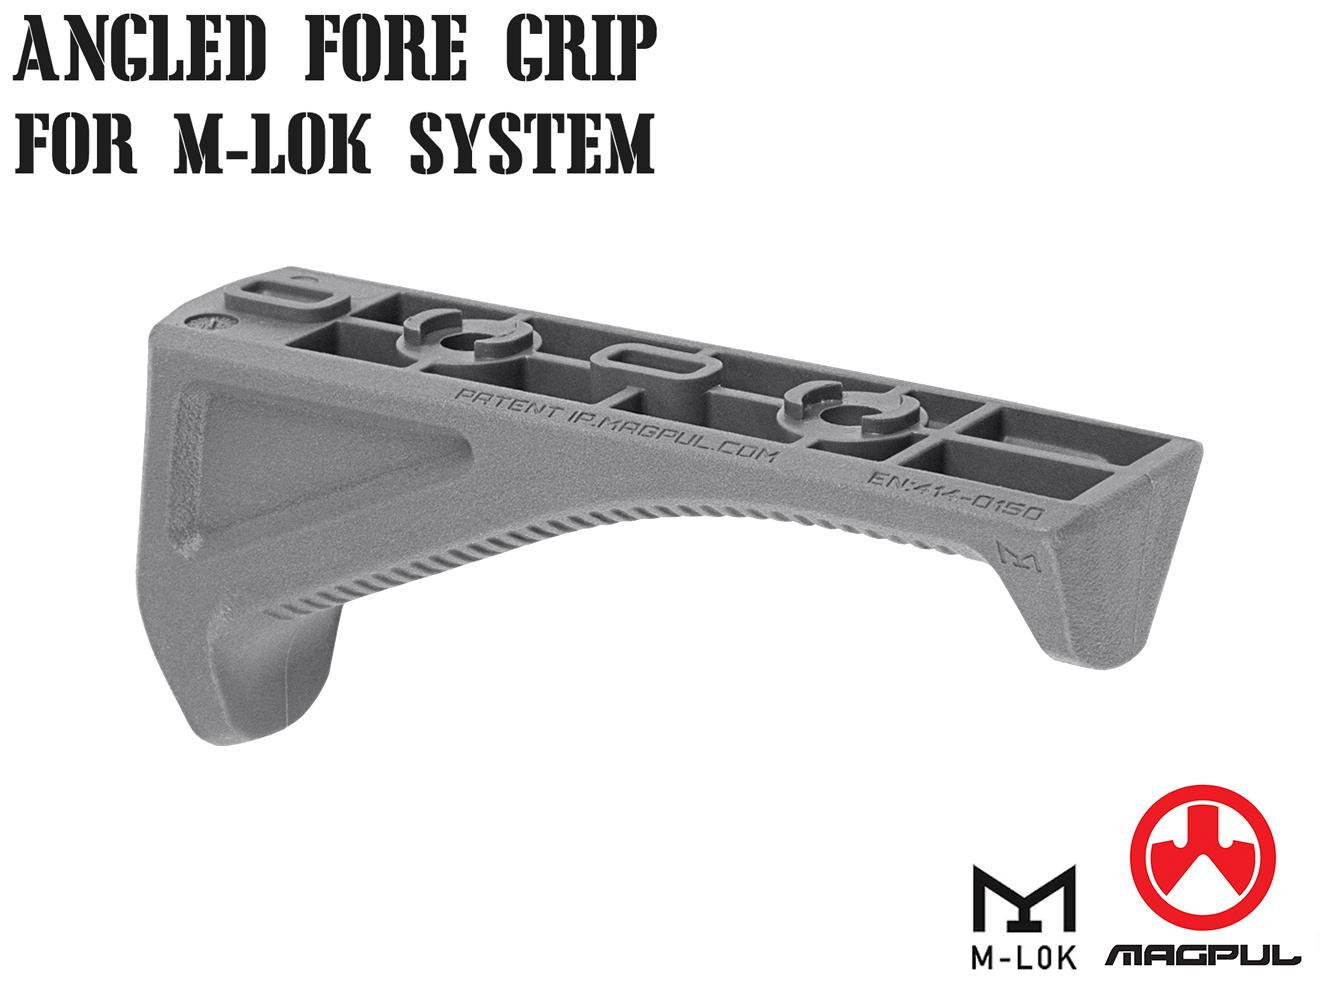 Magpul M-LOK AFG アングルフォアグリップ グレー◆アングルグリップ/ポリマー製/Mロック/軽量/マグプル/MA534450326